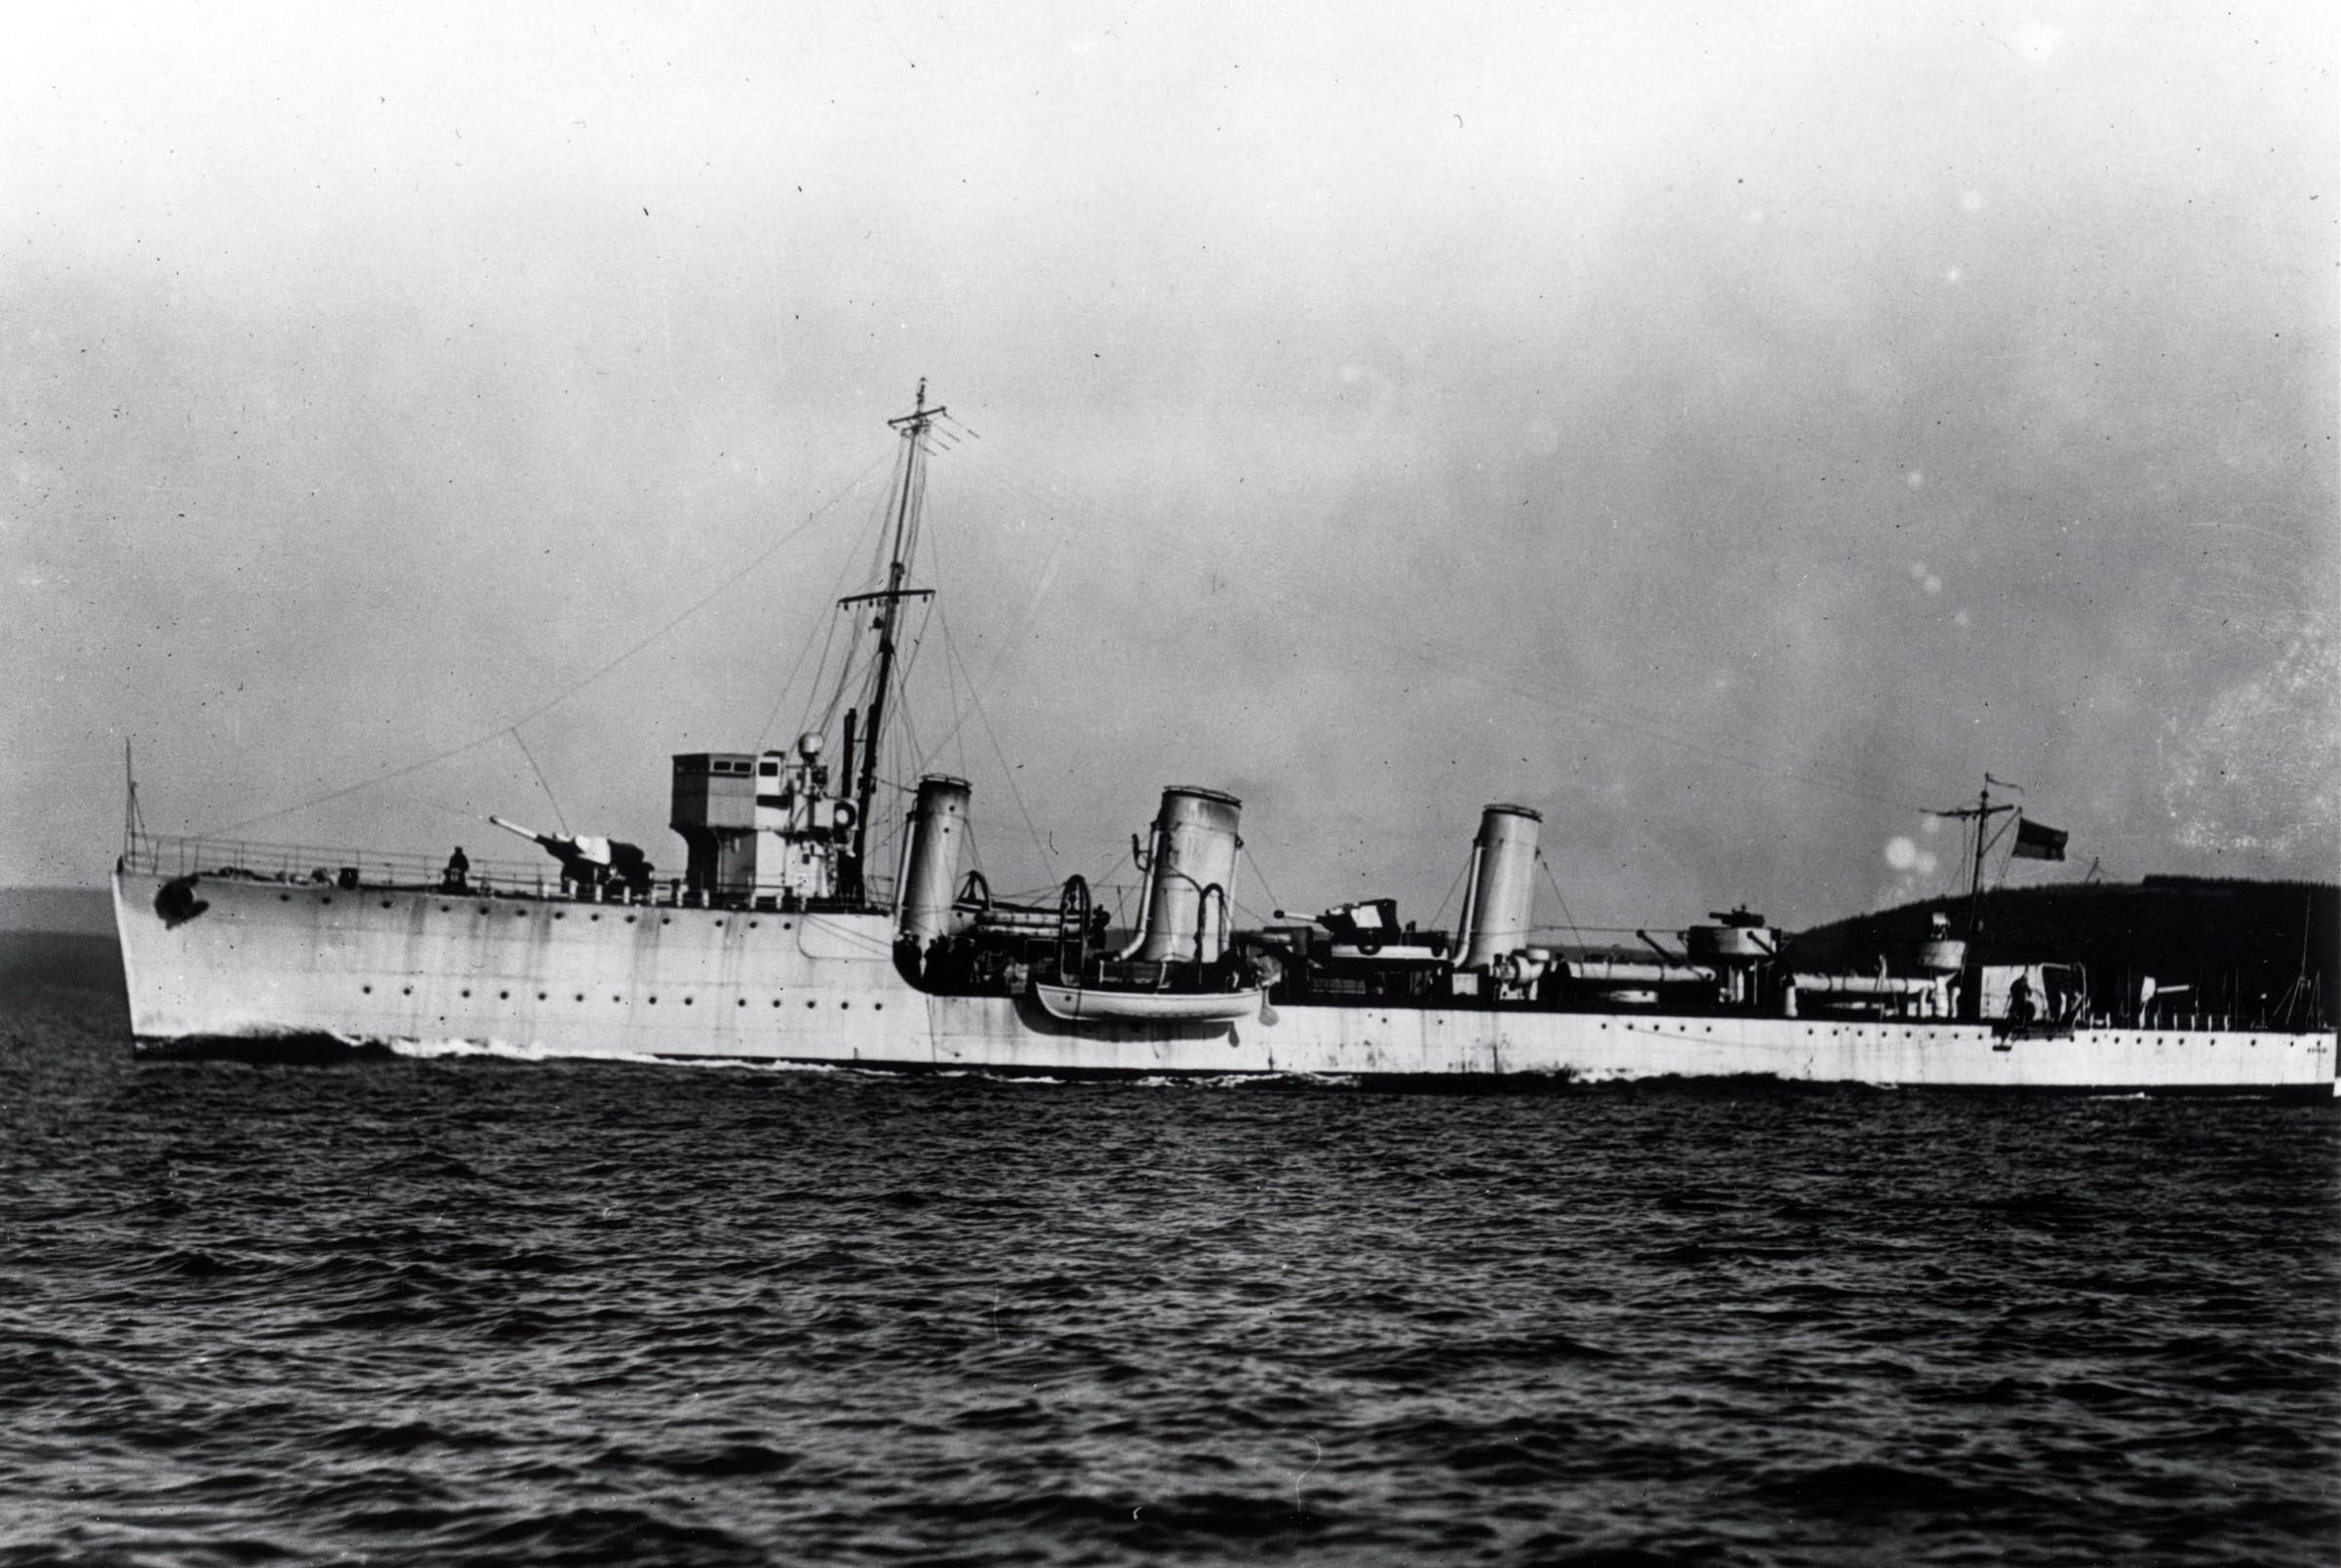 HMCS PATRICIAN